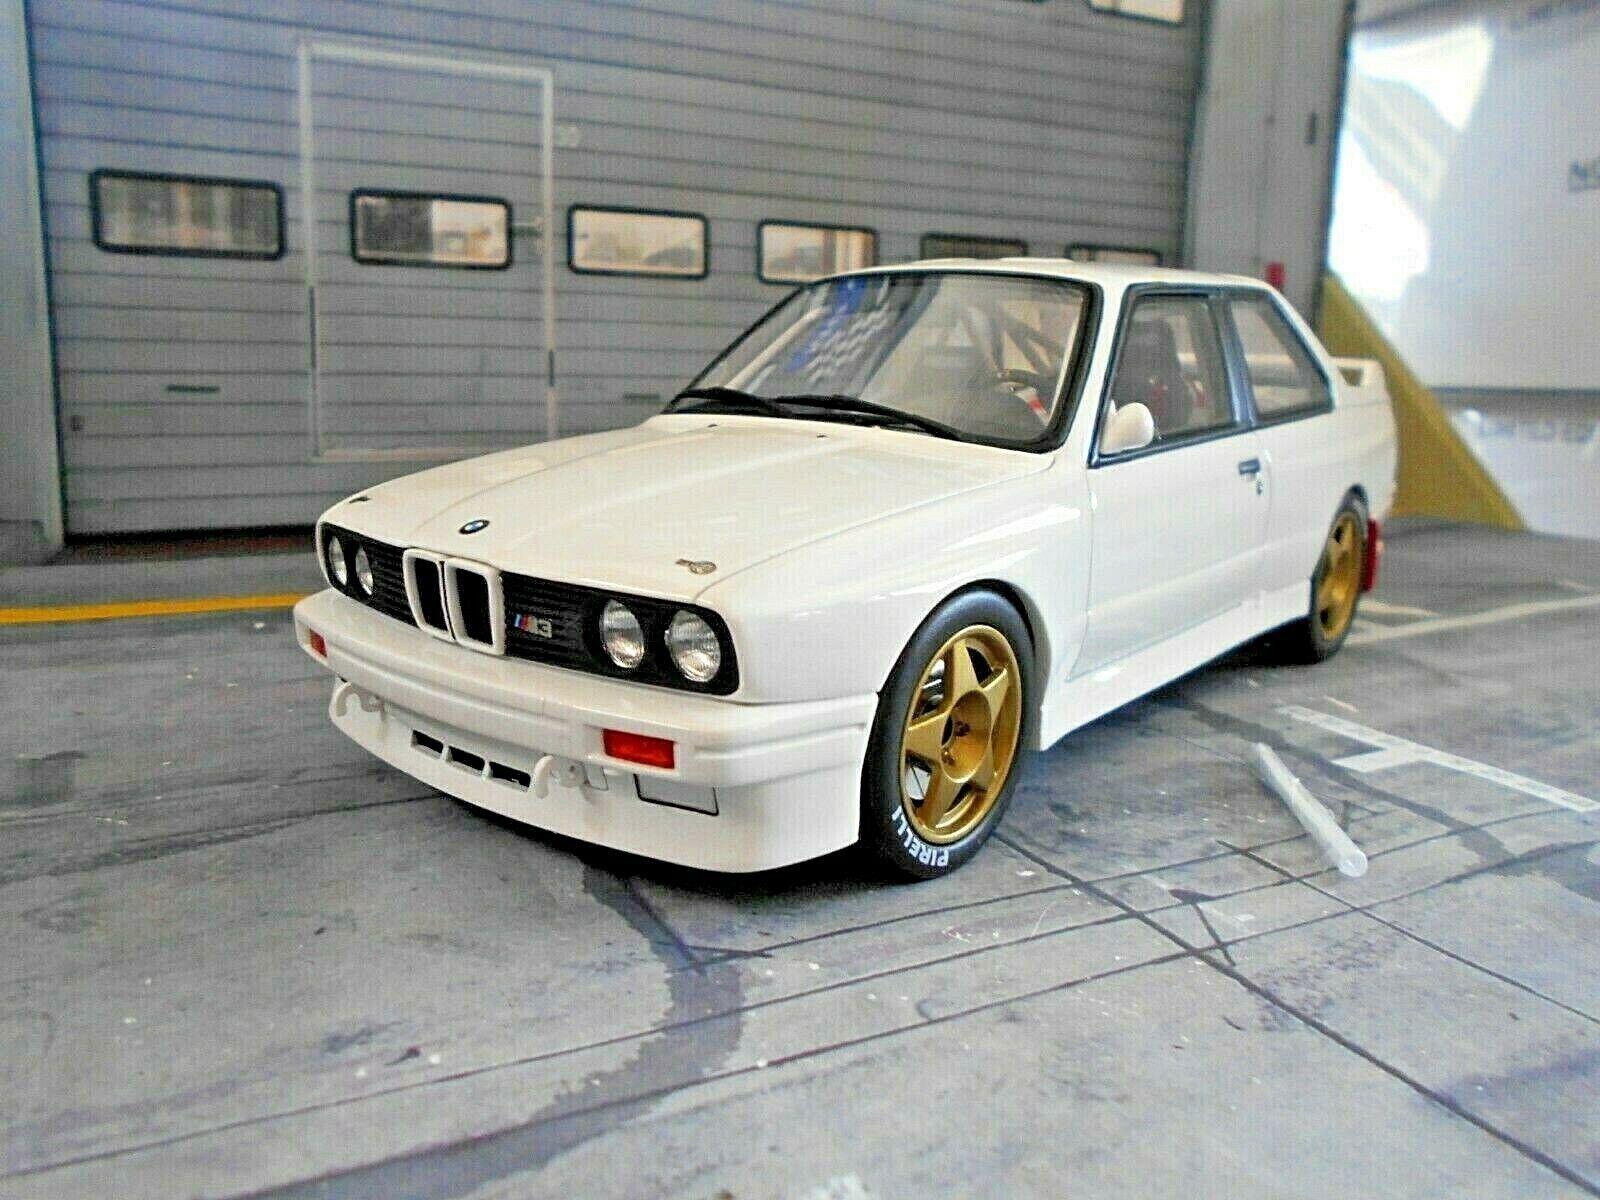 Bmw m3 e30 rally talla a Prodrive rally Whit Weiss plainbody test 1989 Otto 1 18